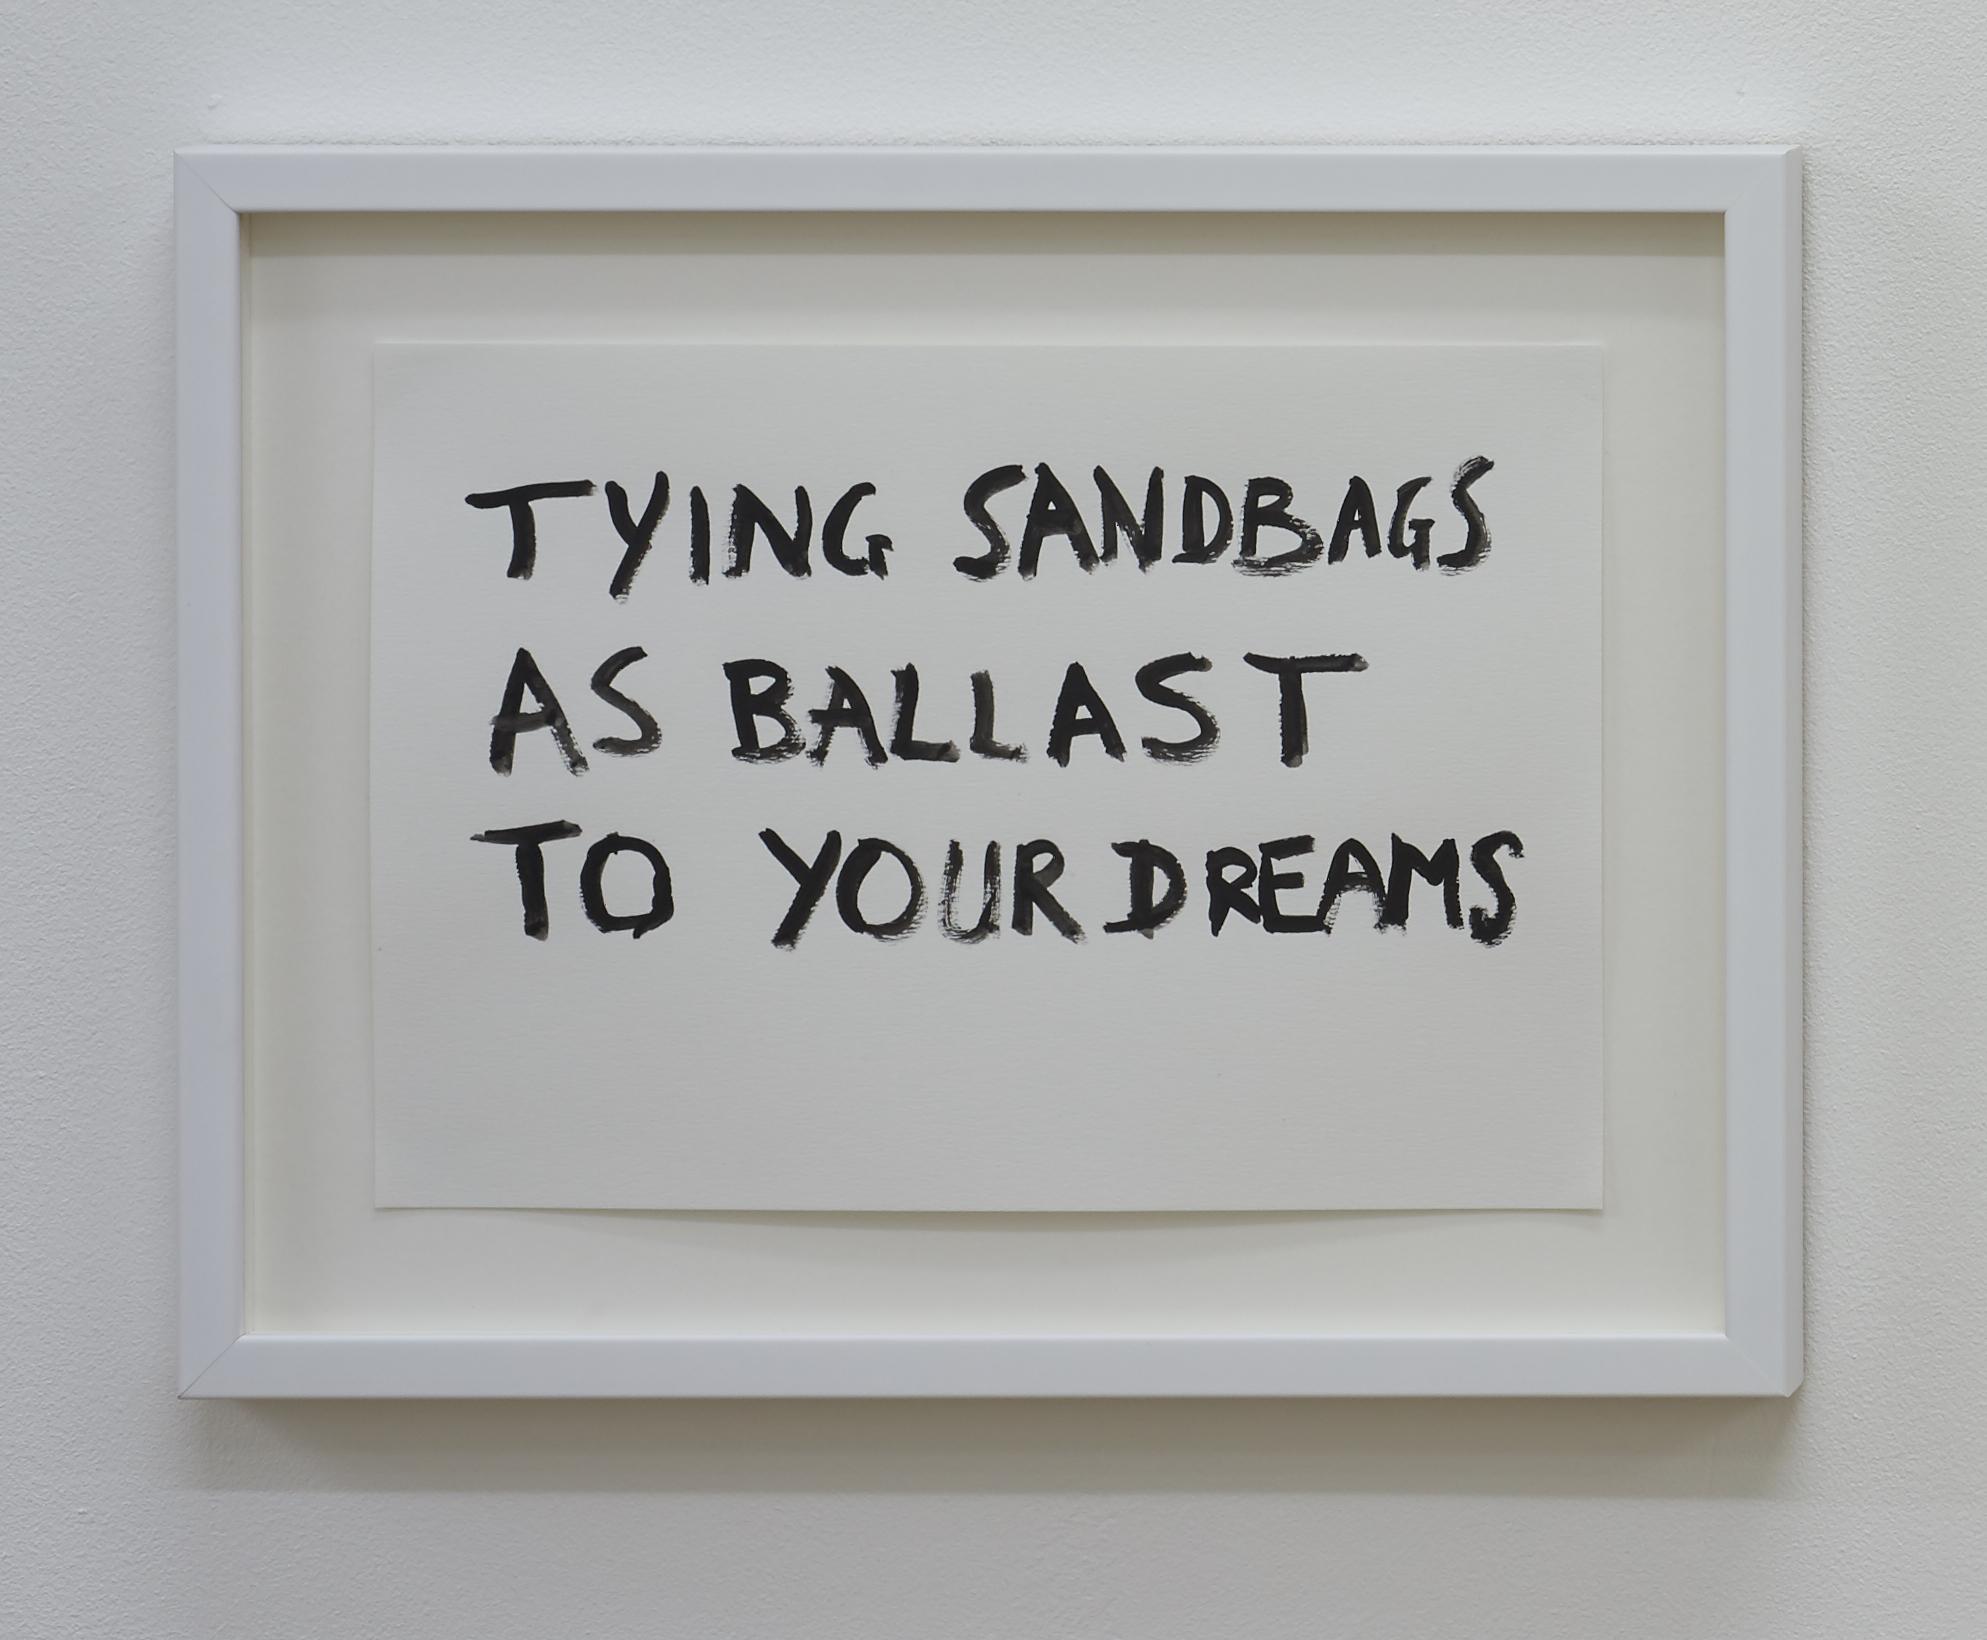 Tim Etchells, Ballast, 2015. Black acrylic on archival paper. Framed. 29.7 x 21 cm.